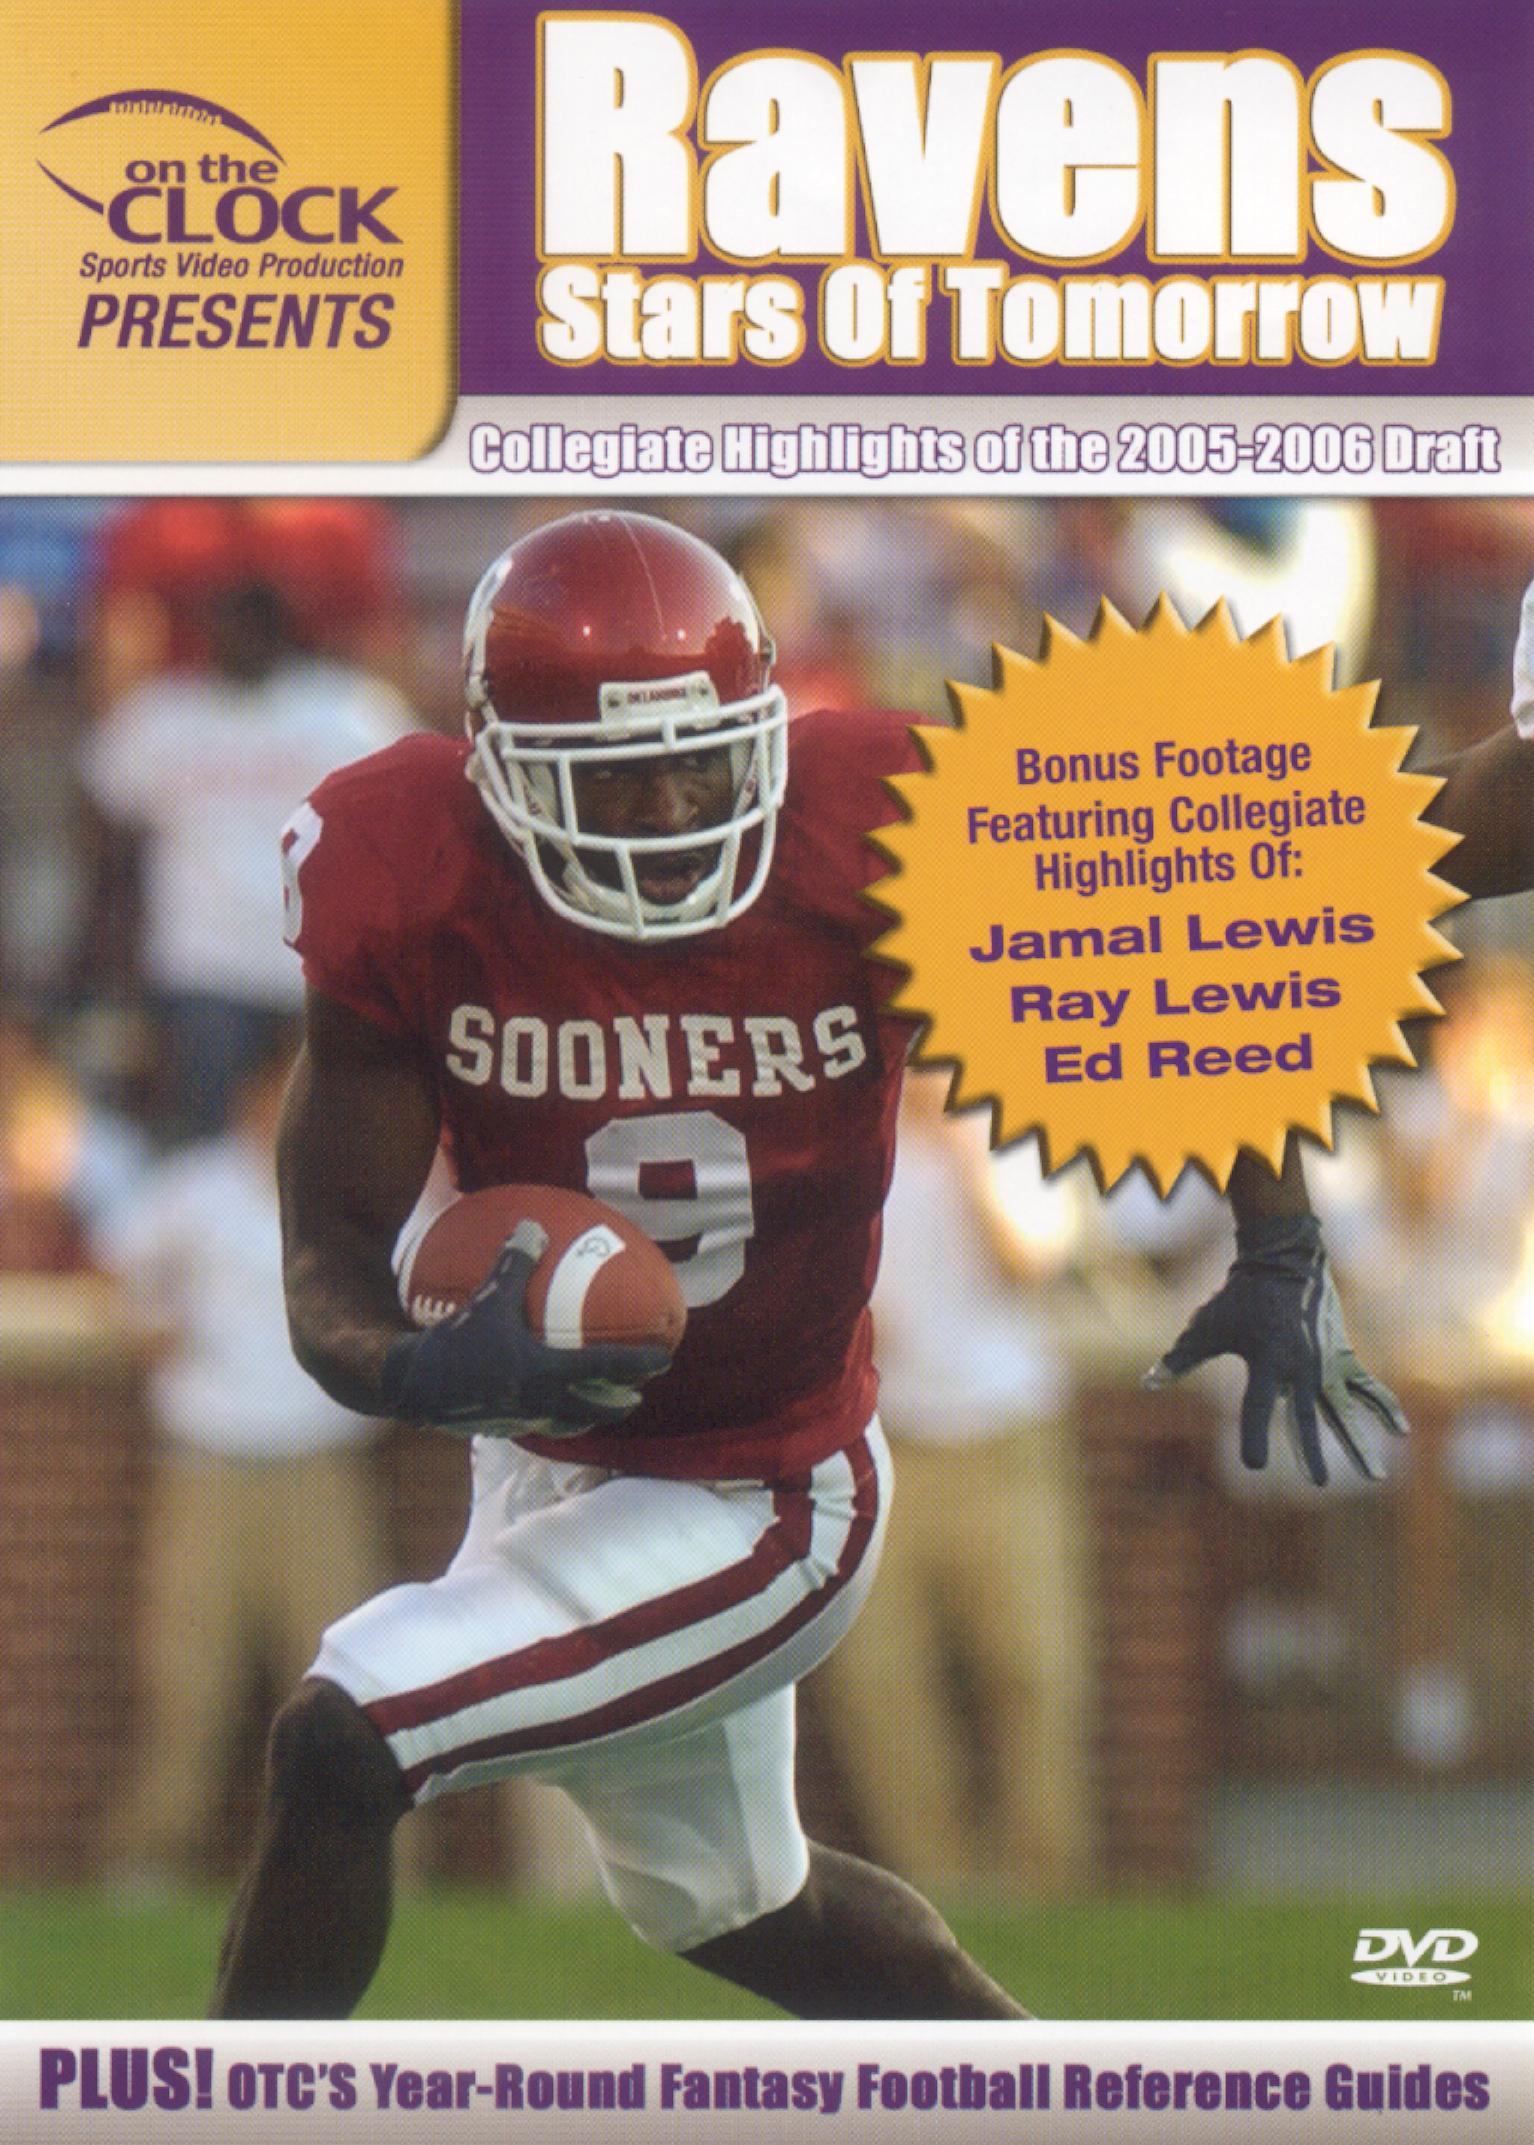 On the Clock Presents: Ravens - 2005 Draft Picks Collegiate Highlights